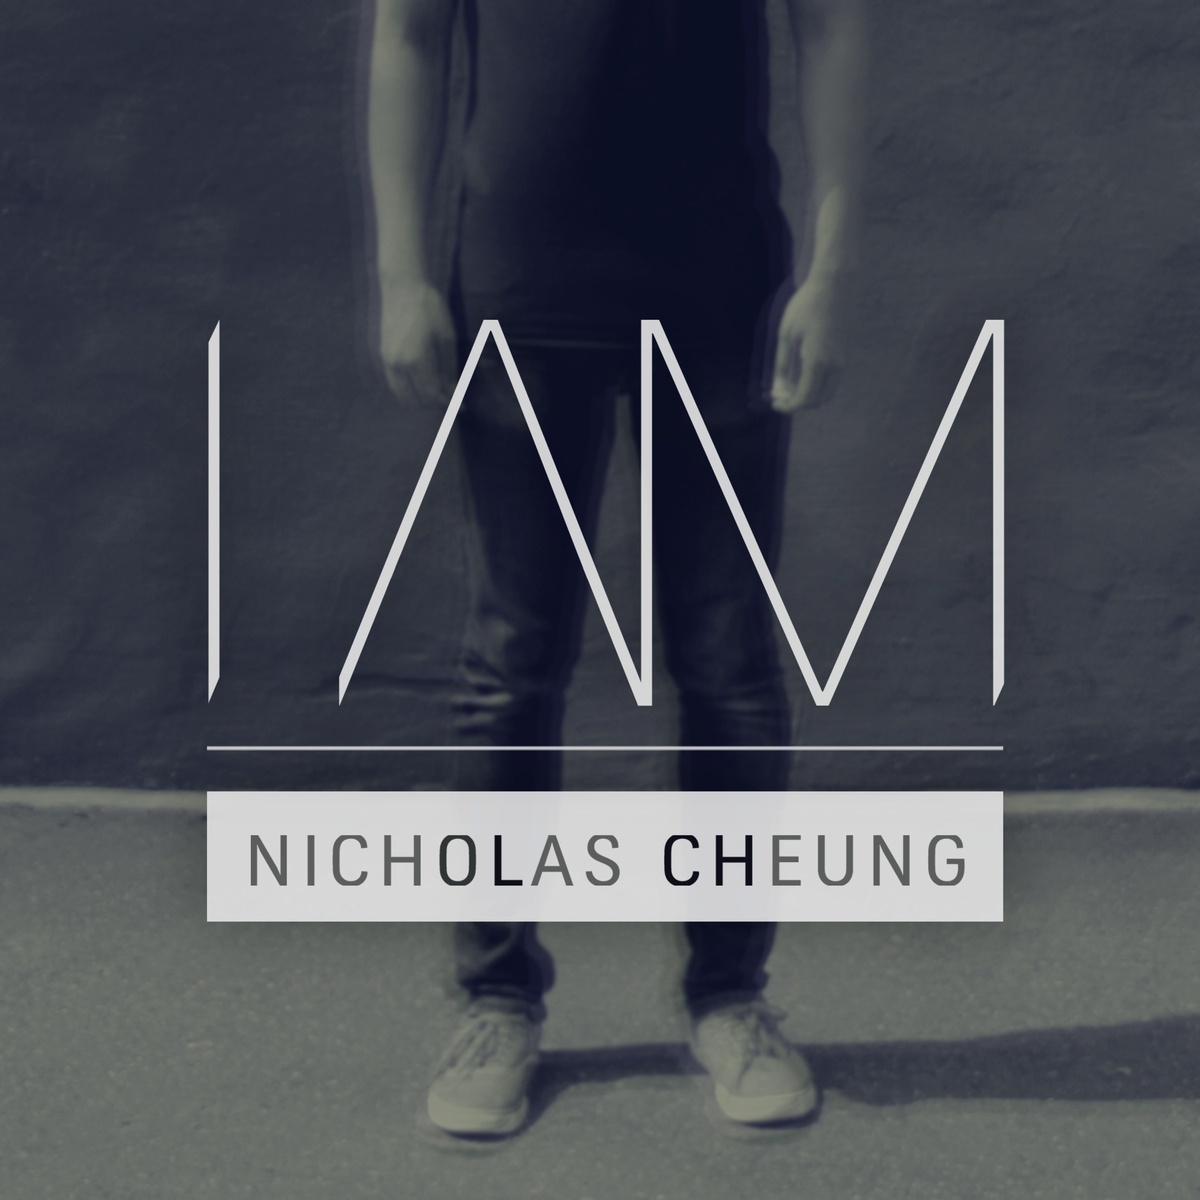 Nicholas Cheung I Am